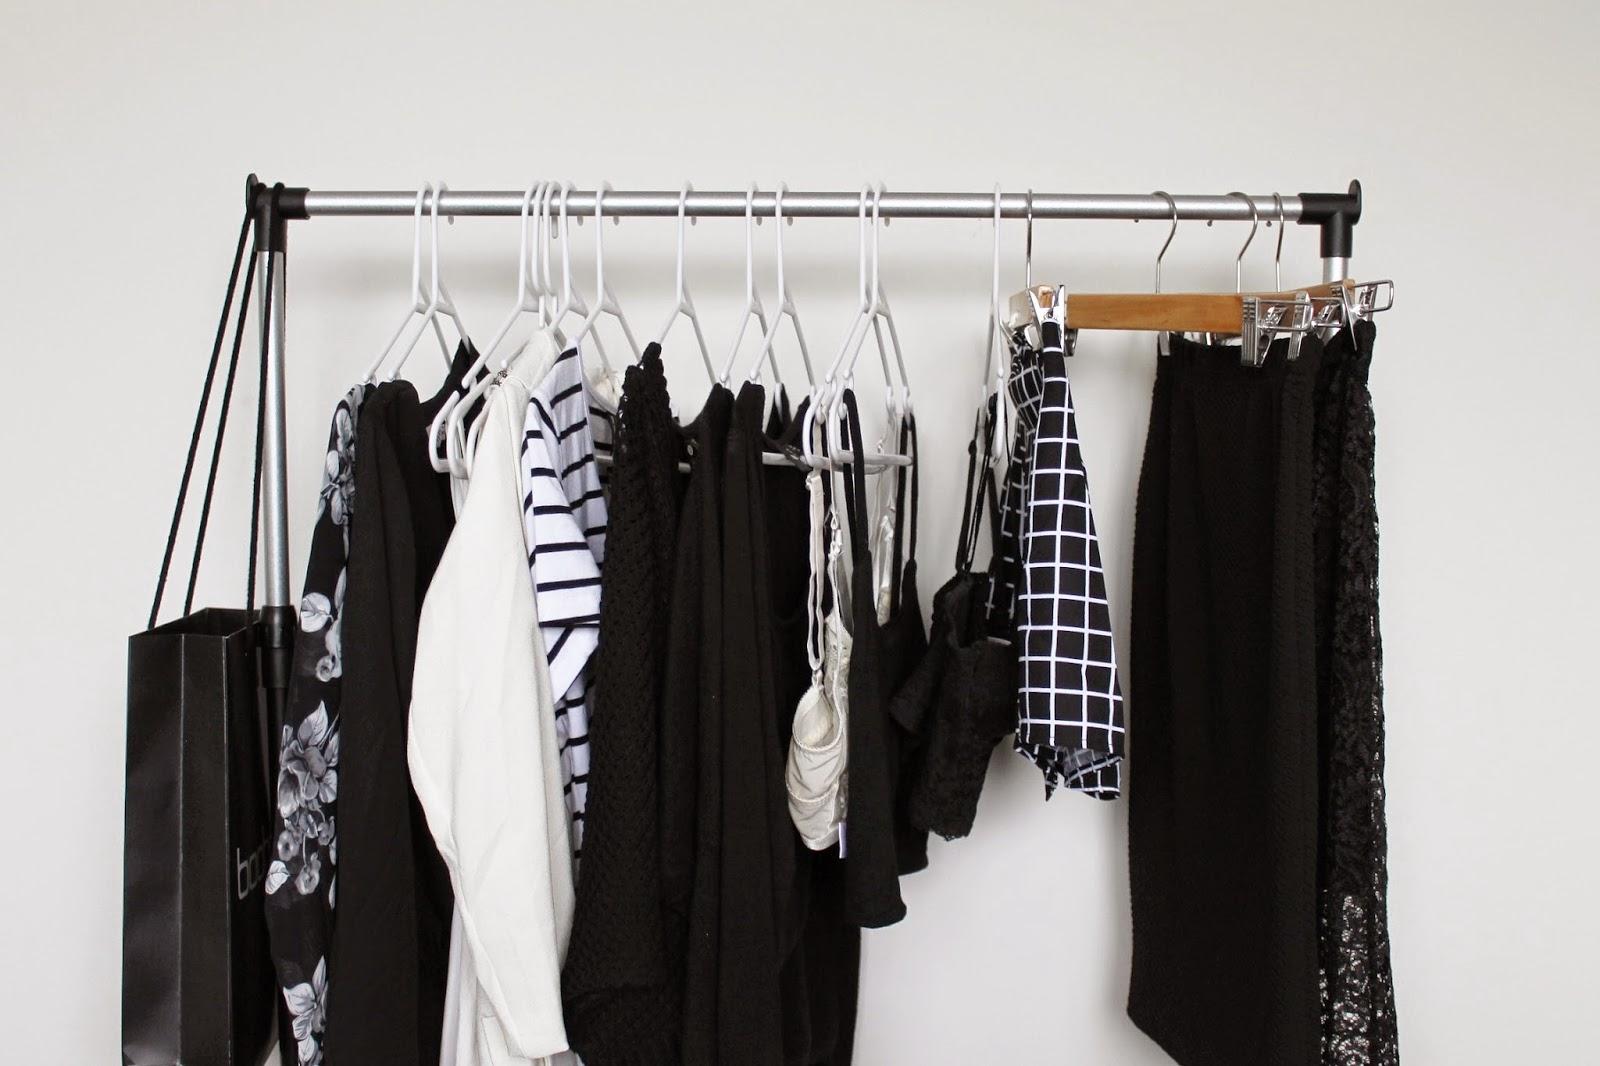 INSPIRATION TIME #1 | CLOTHING RACK